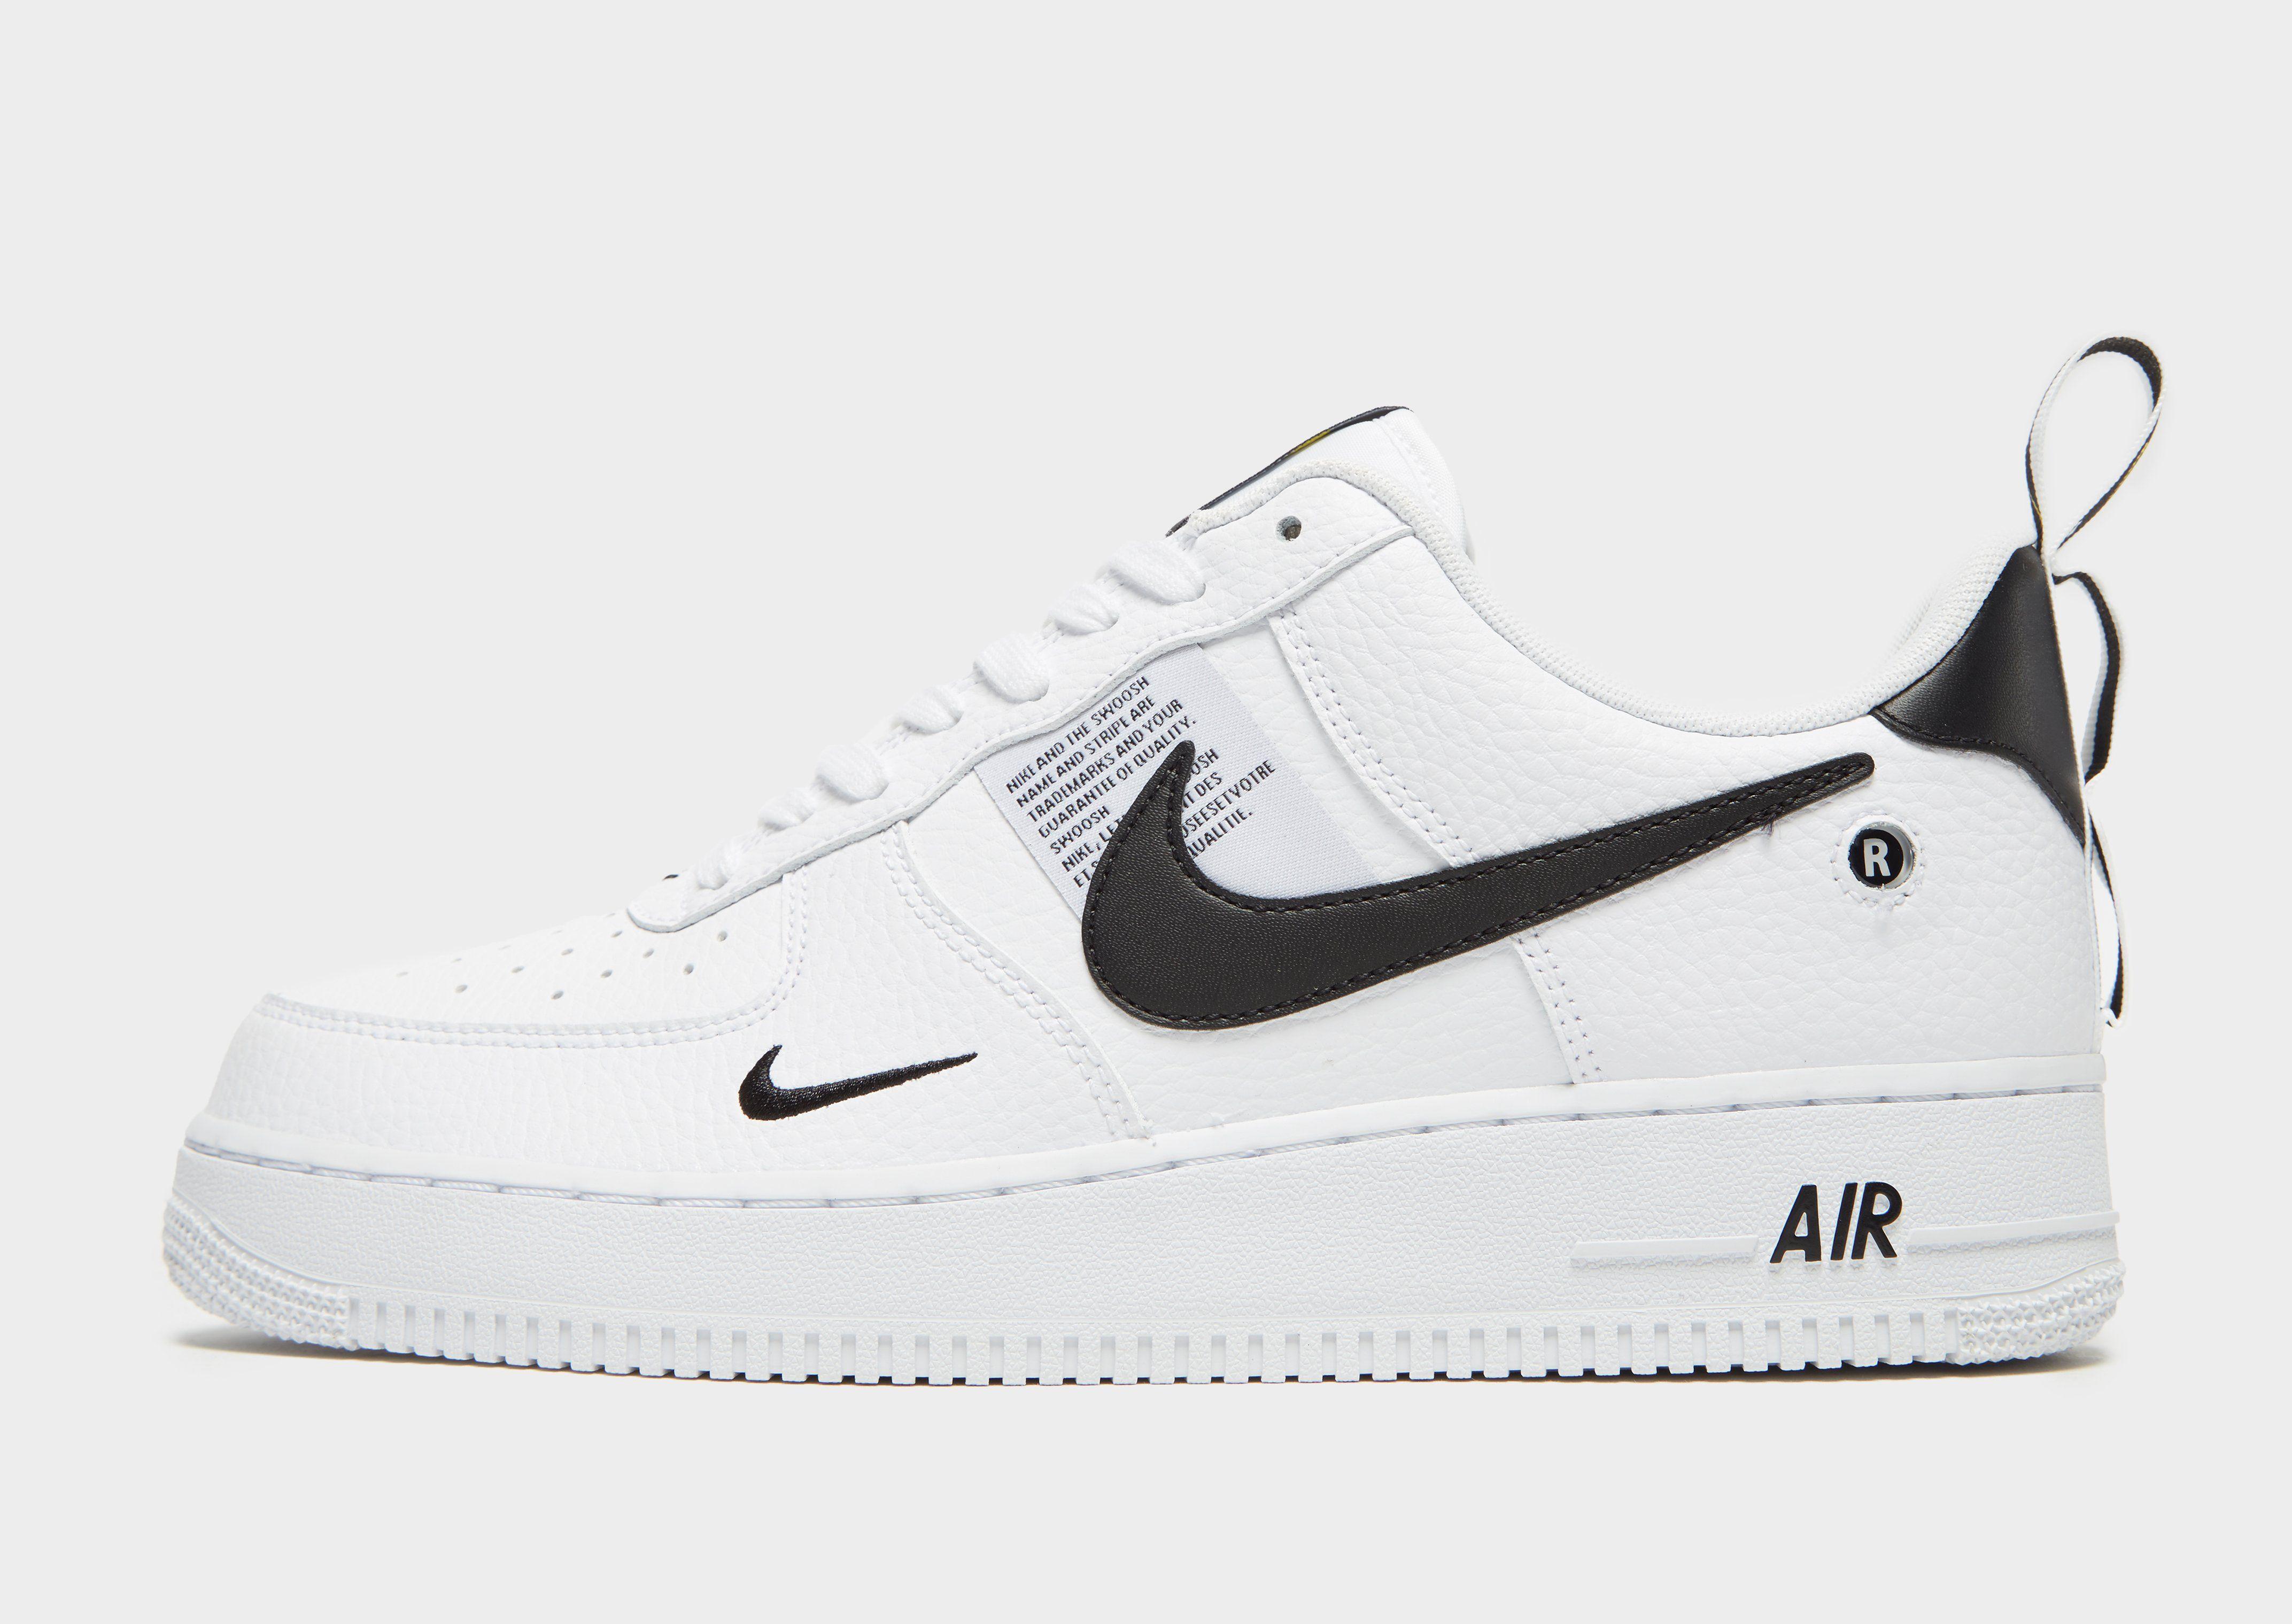 buy popular 9d0f6 9152f Nike Air Force 1 '07 LV8 Utility Low | JD Sports